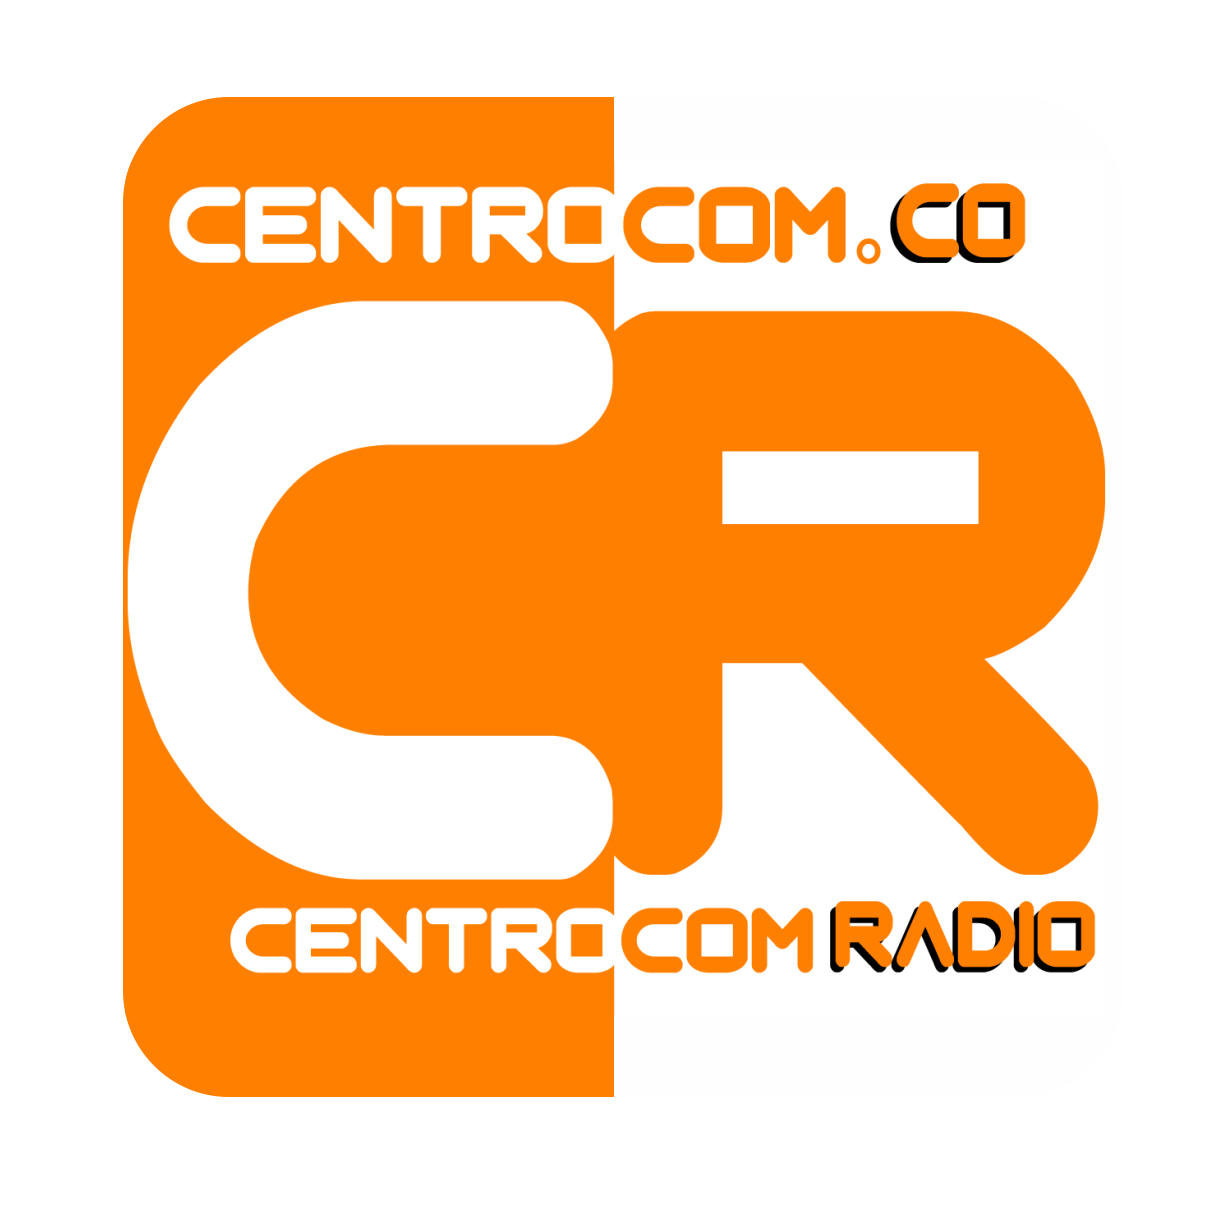 Centrocom radio